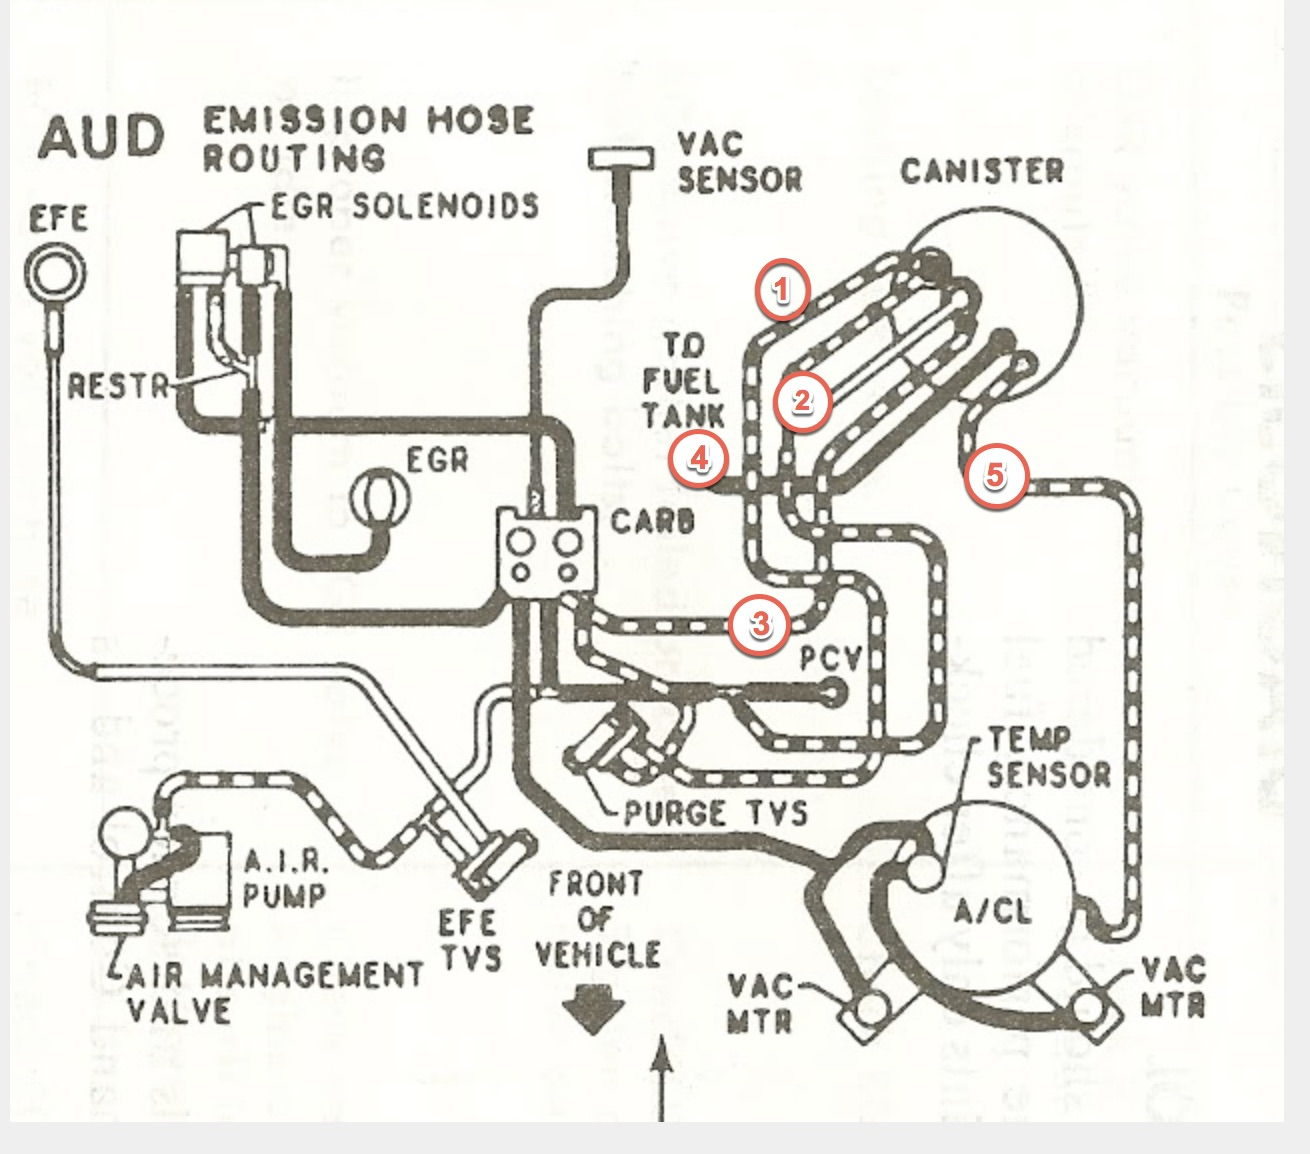 precision fuel pump wiring diagram ducane furnace imageresizertool com